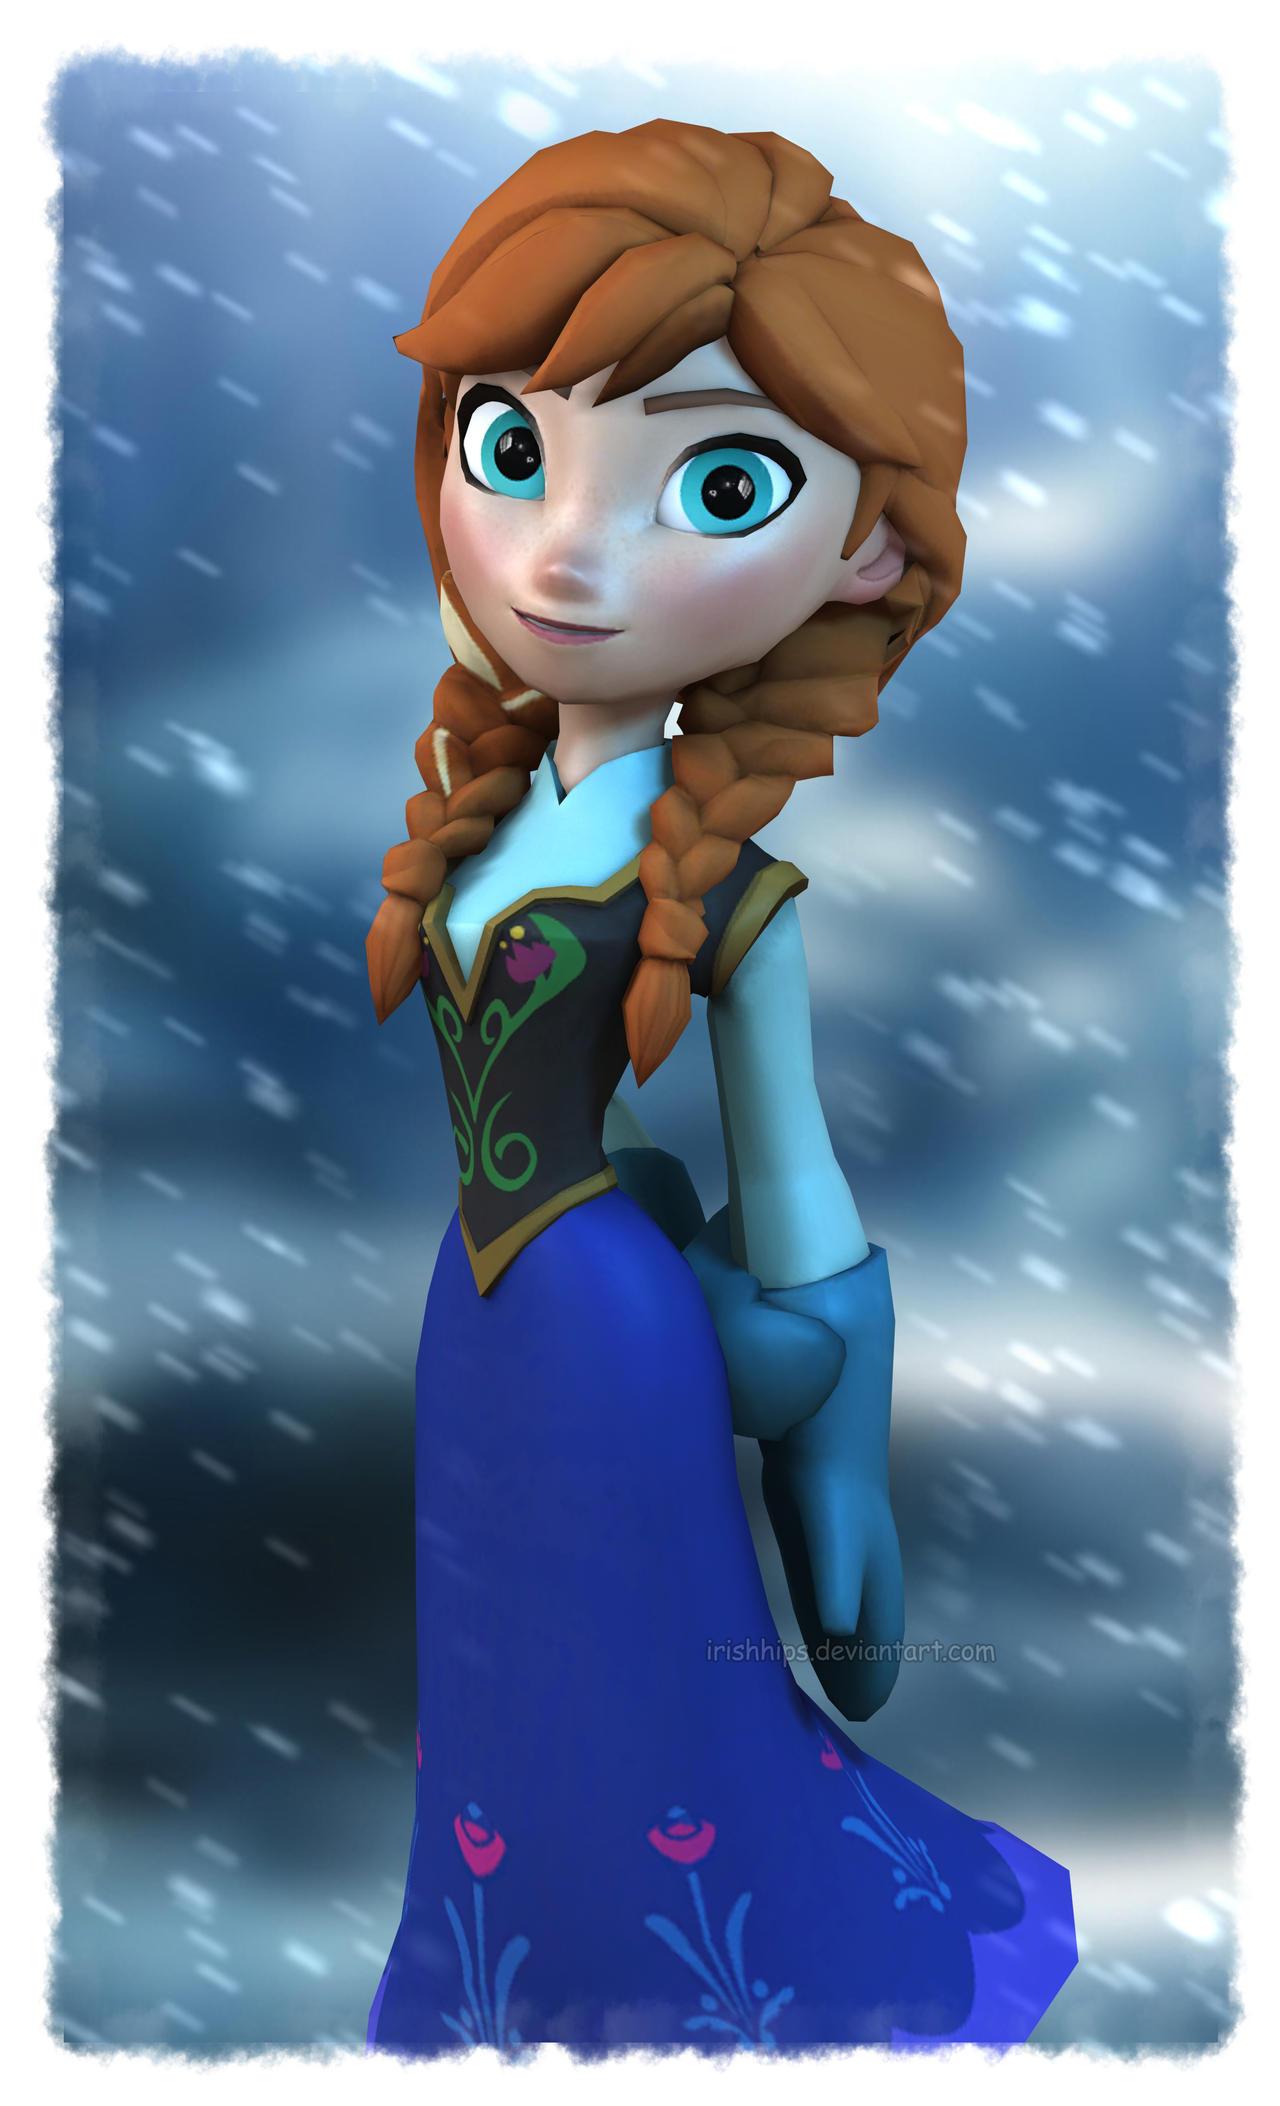 Frozen 2 - Anna Phone Wallpaper - Disneys Frozen 2 Photo